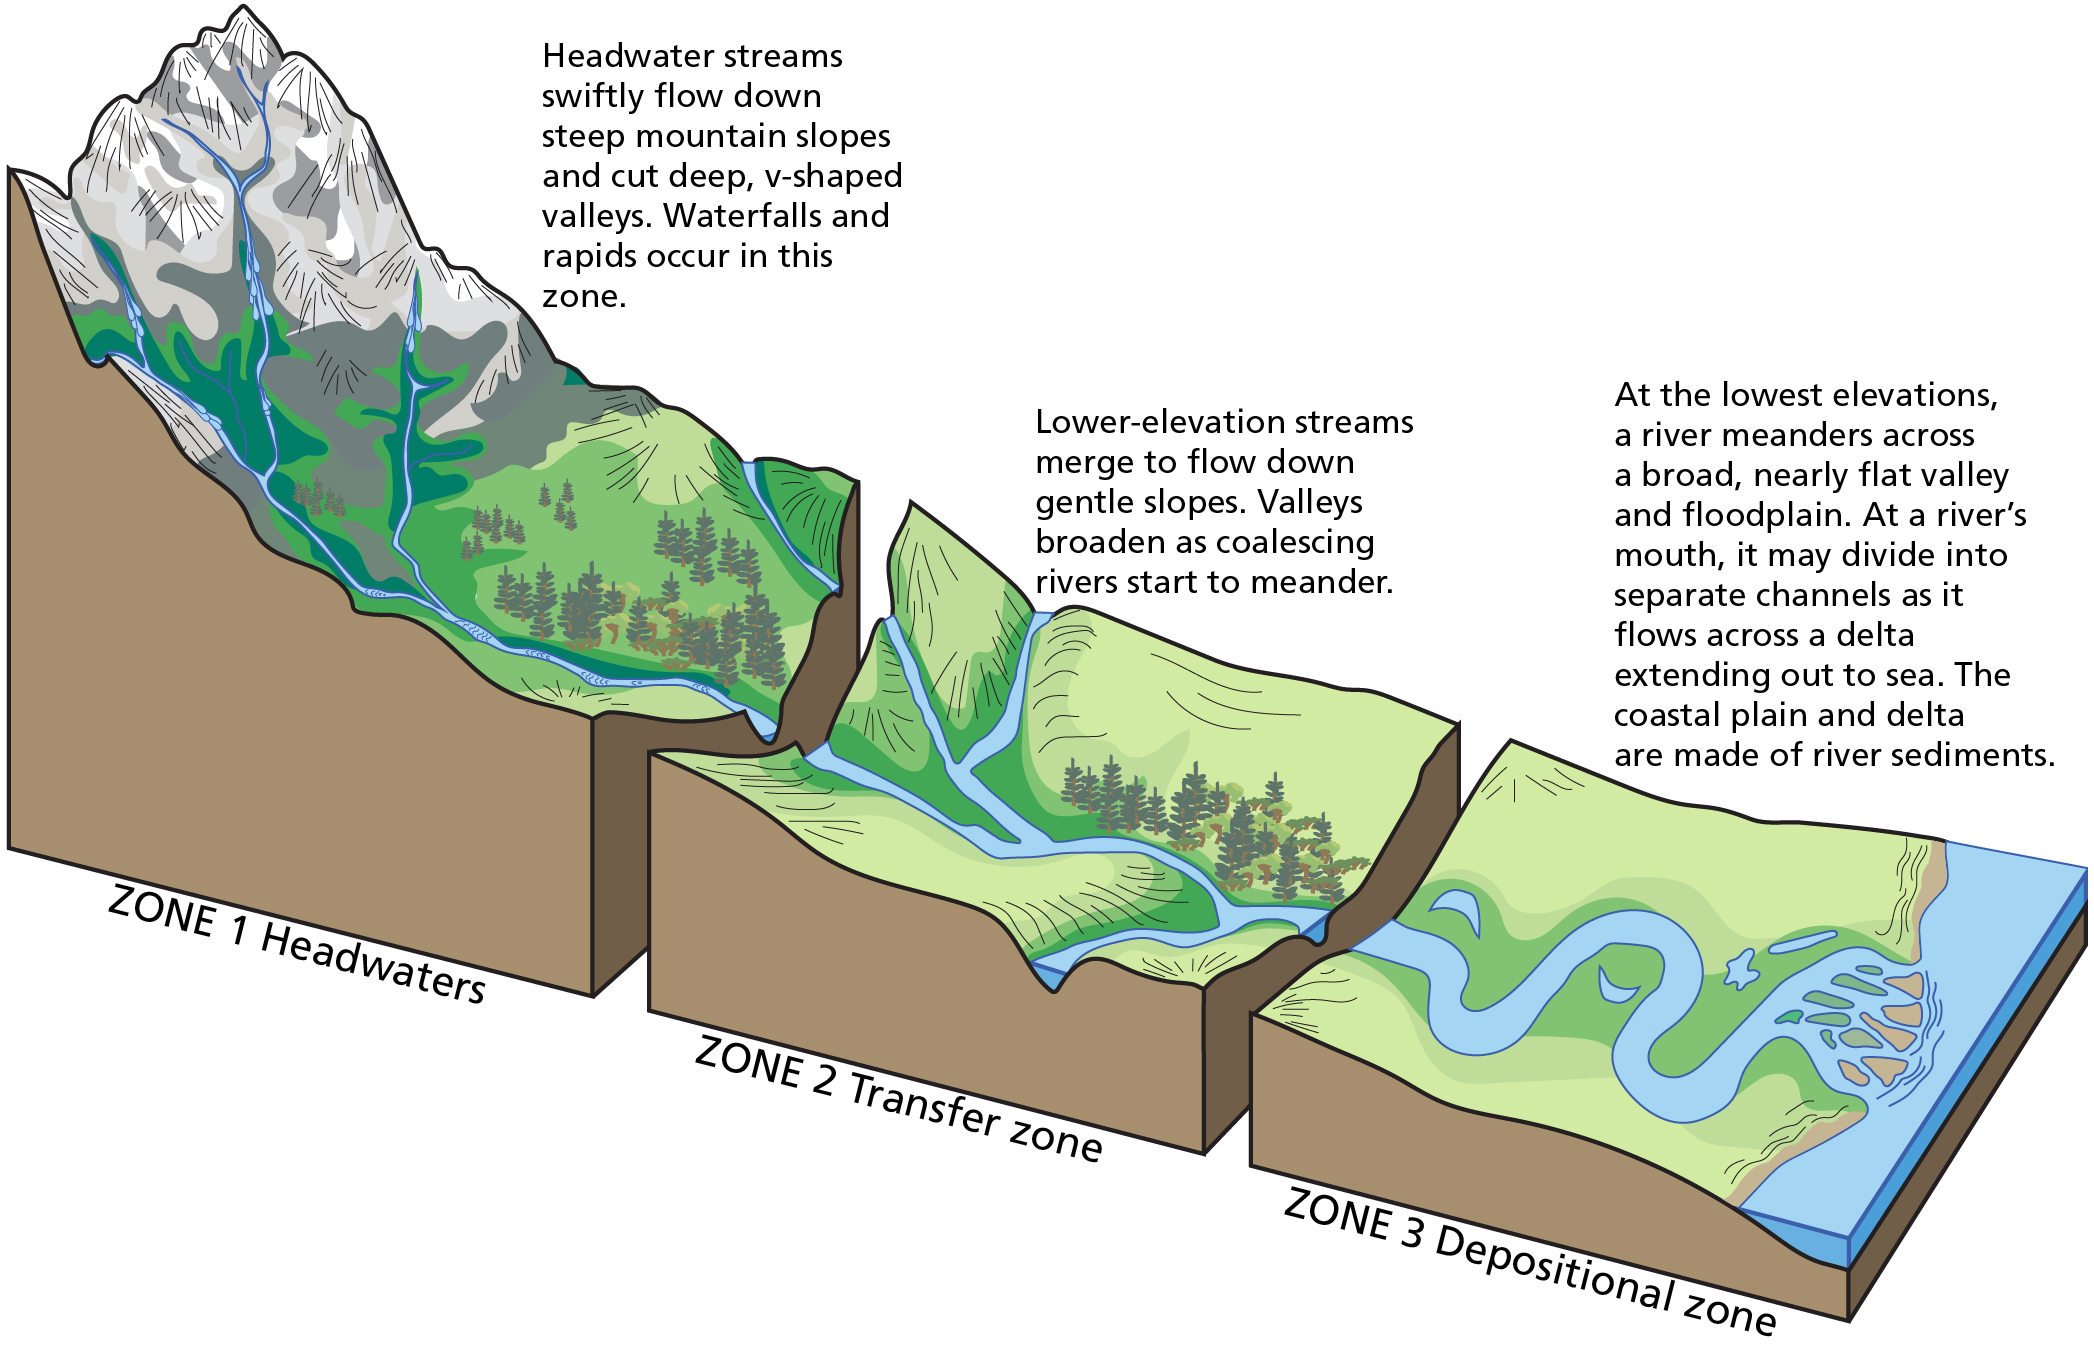 drainage basin divide water flow diagram wiring diagram  drainage basin divide water flow diagram #7